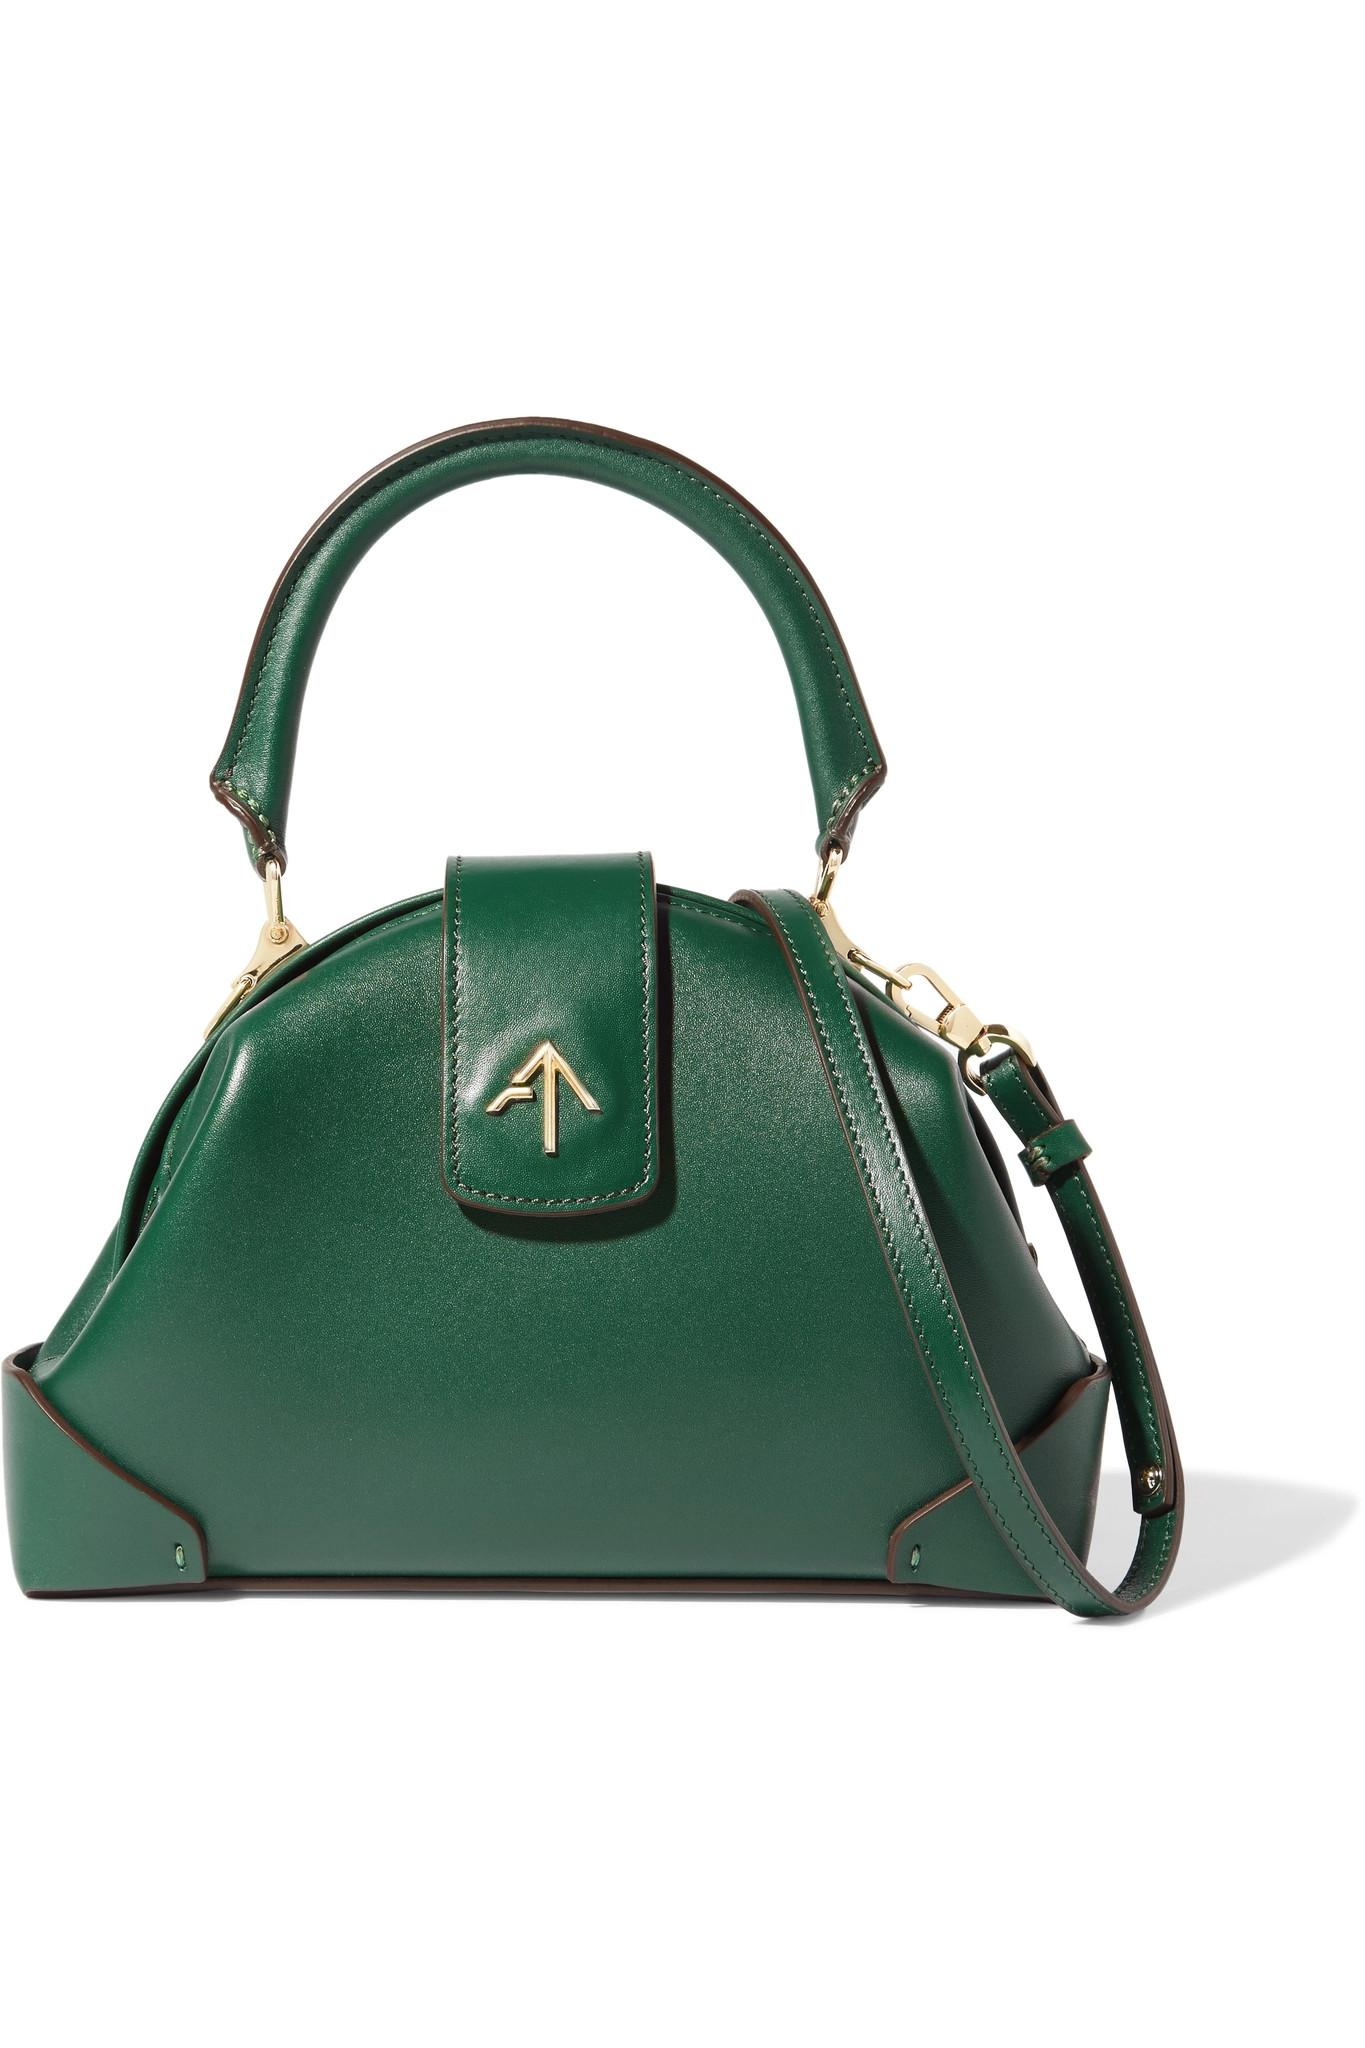 Manu Atelier demi linen and leather crossbody bag Discount Footlocker Finishline 3ymazsxtX